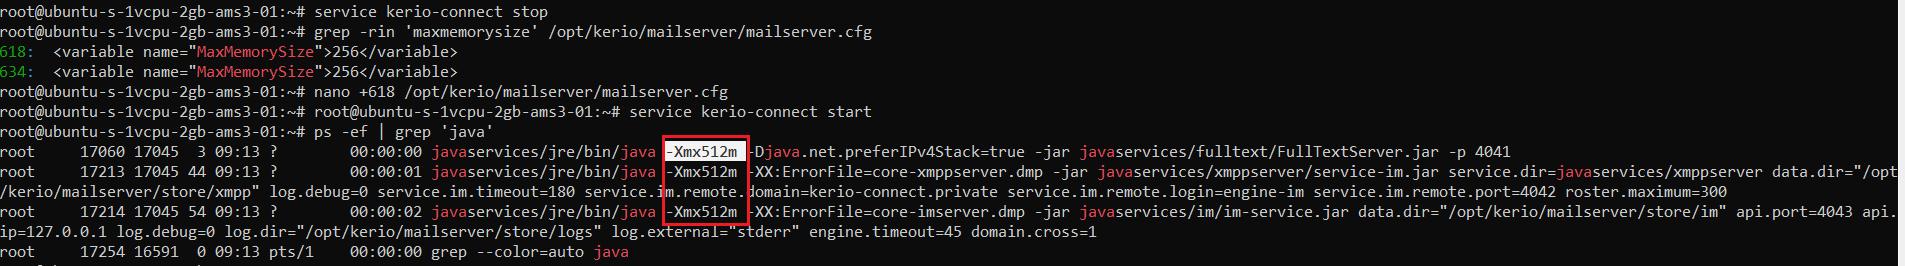 linux_optimization4.png